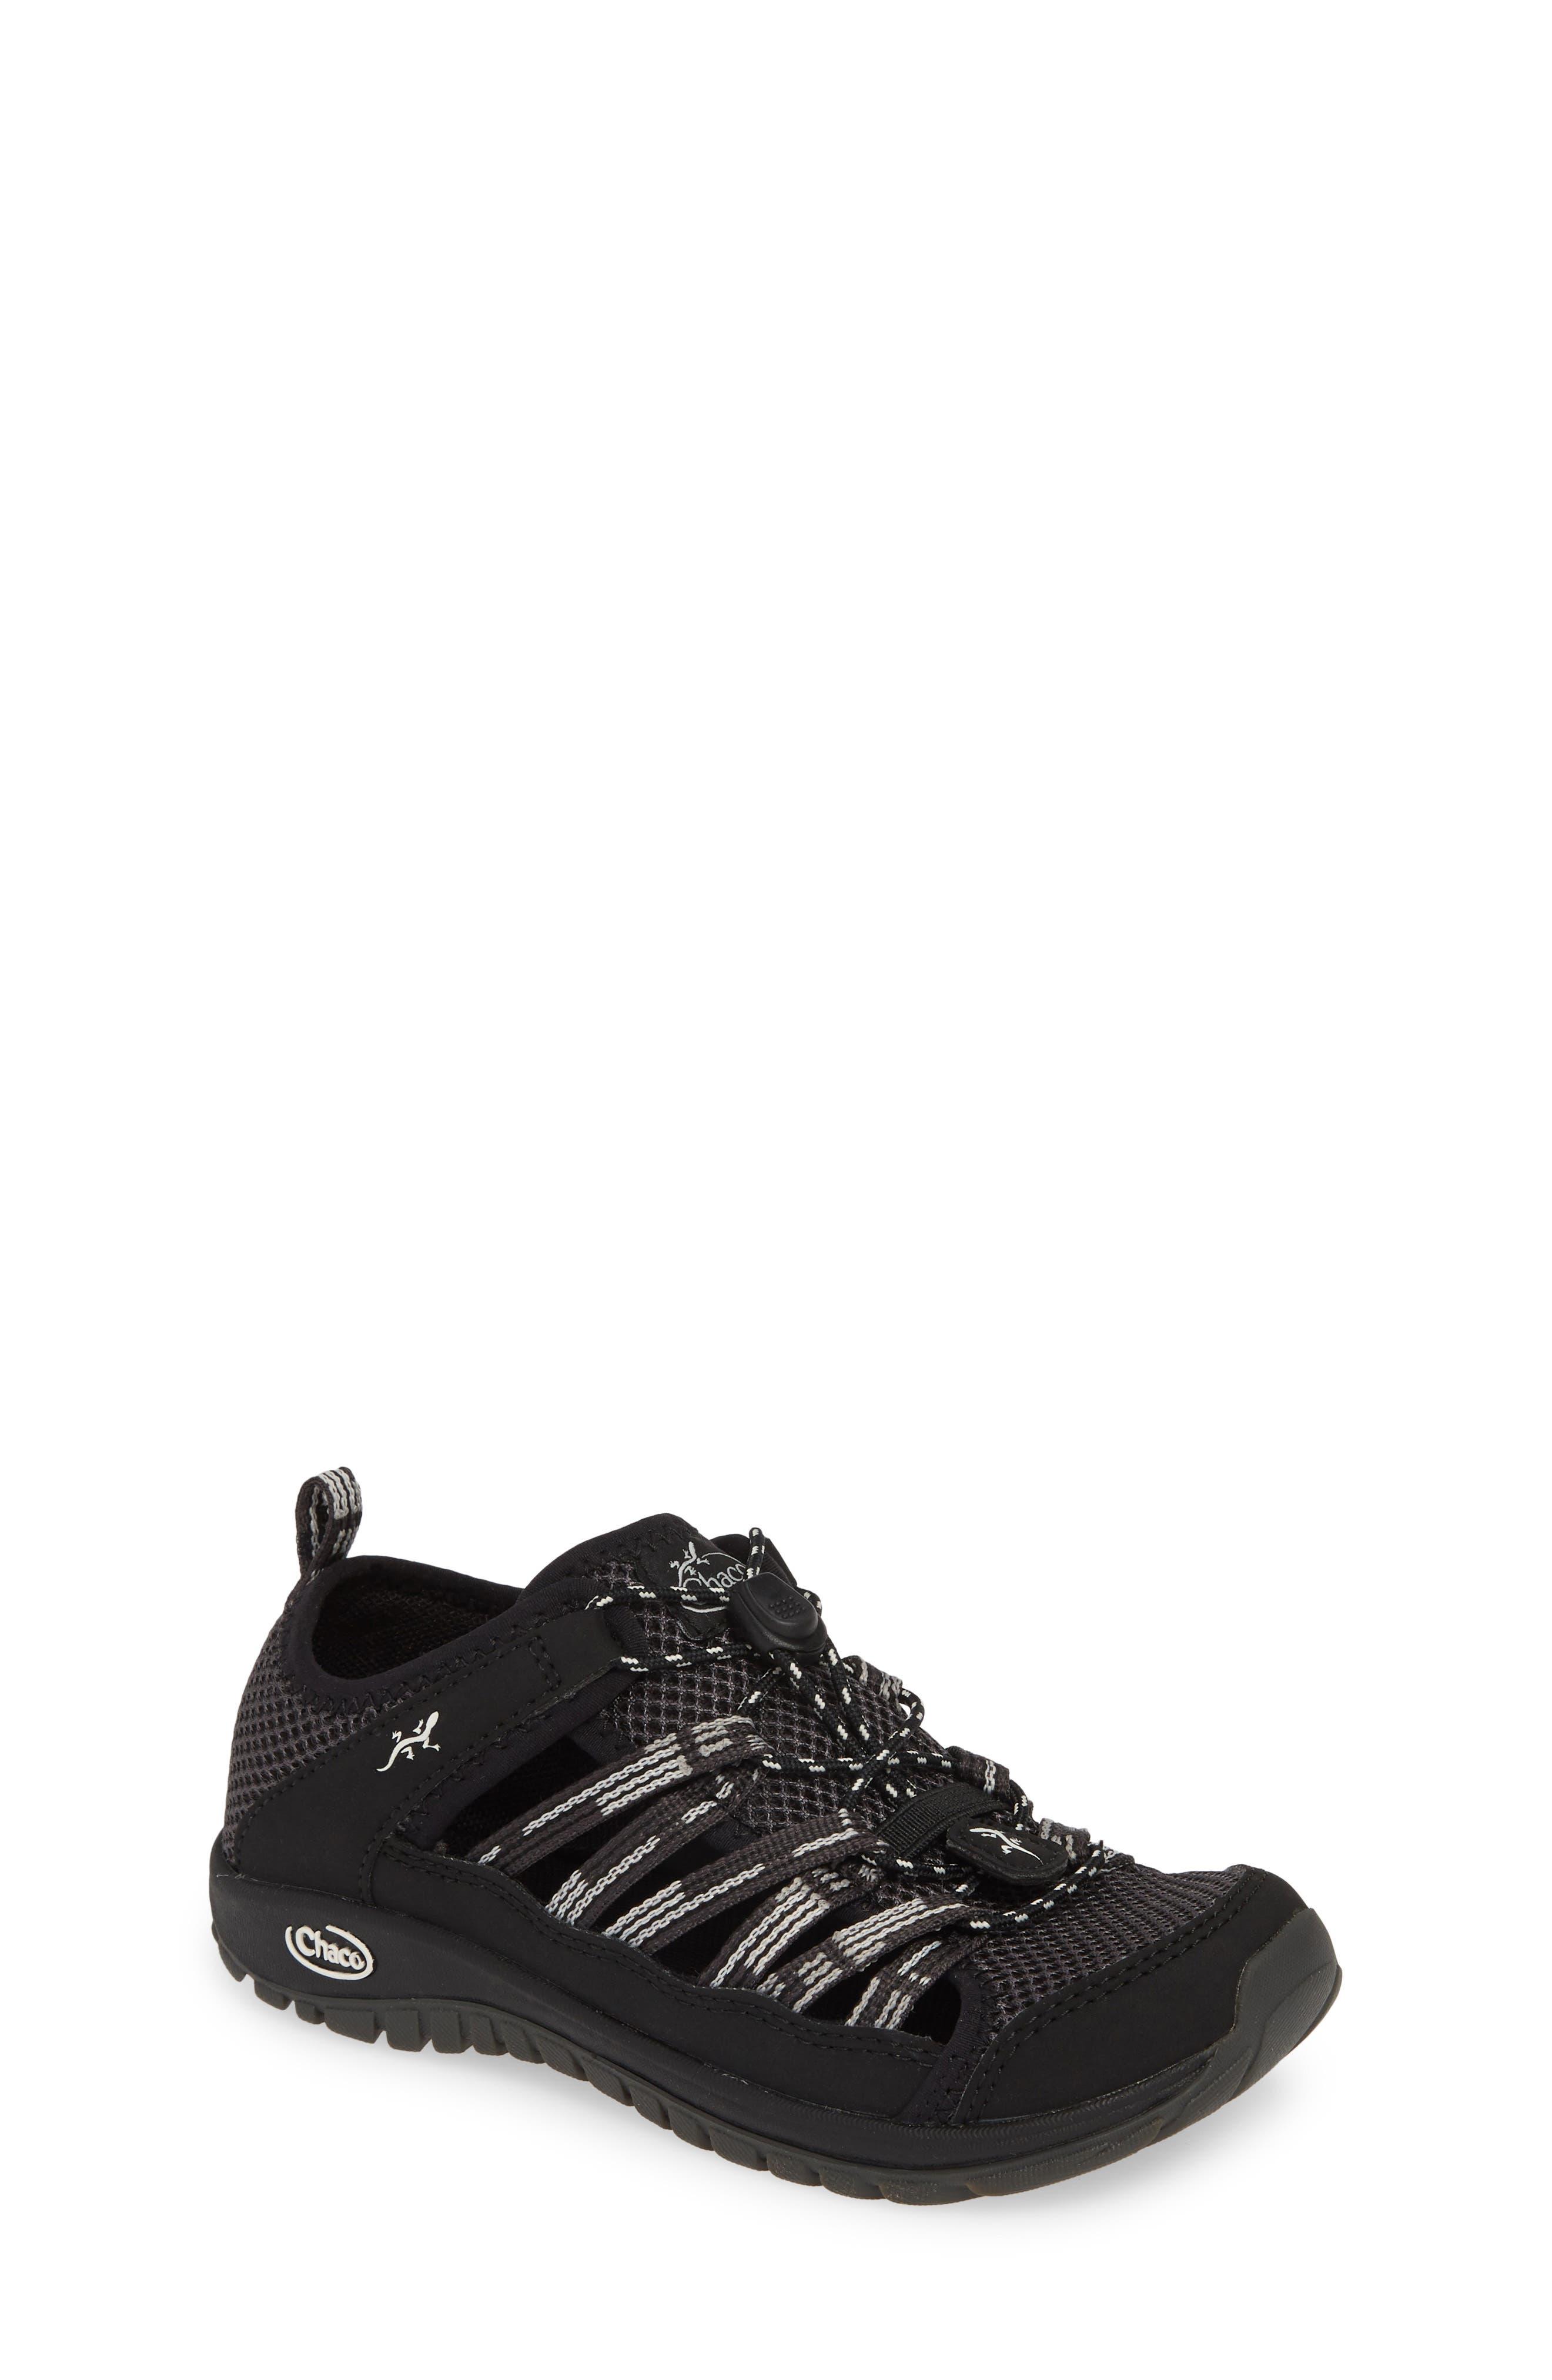 CHACO, Outcross 2 Water Sneaker, Main thumbnail 1, color, PAVEMENT BLACK